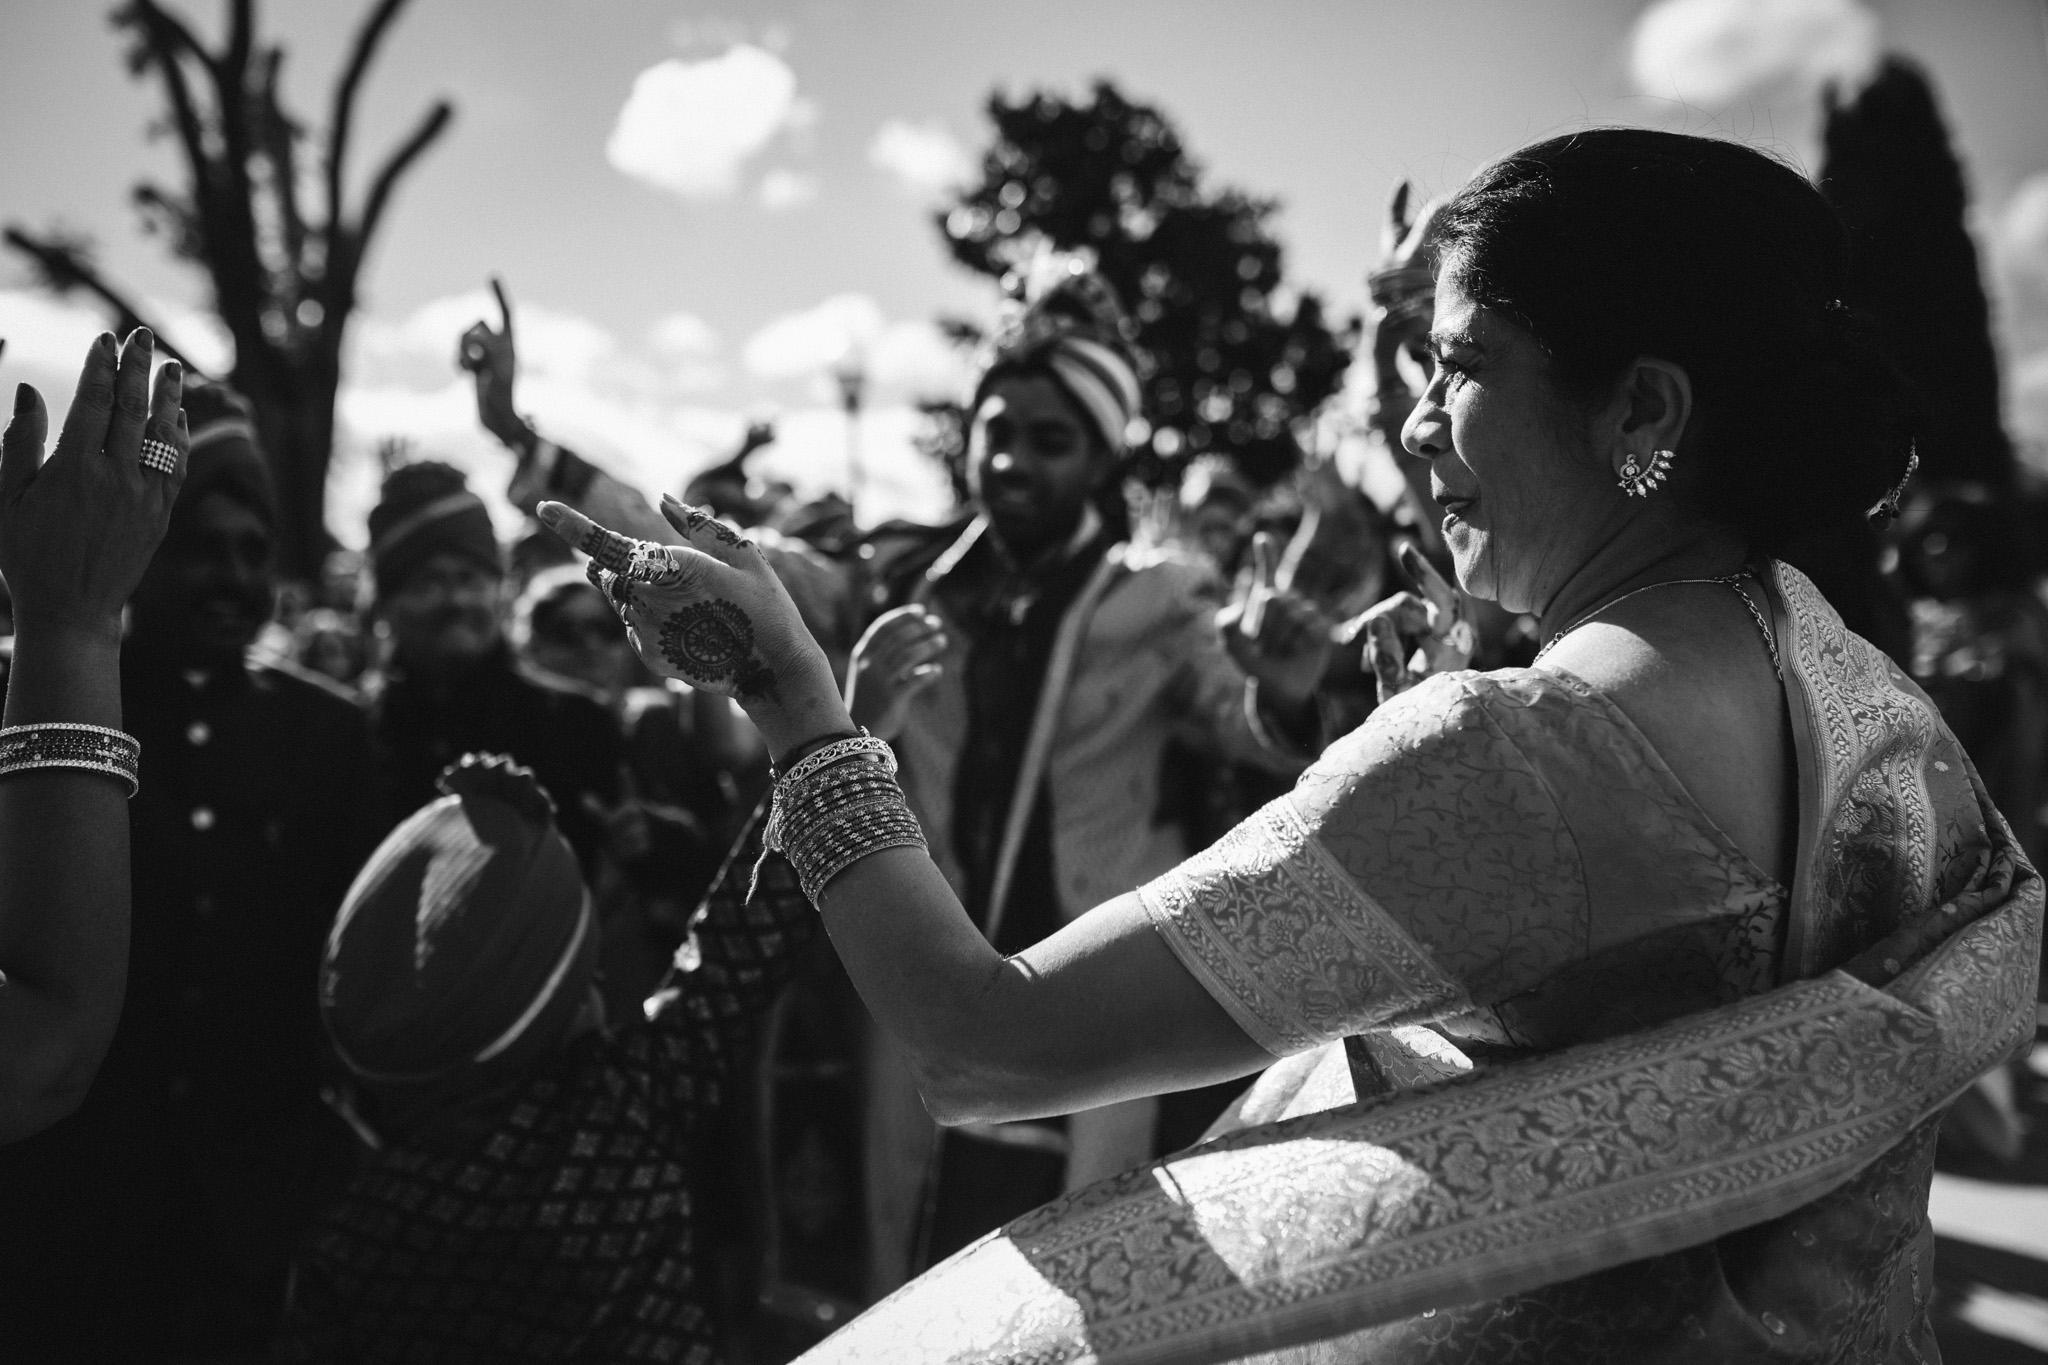 rebeccaburtphotography.hindiwedding.moraisvineyards.virginiawedding-100.JPG